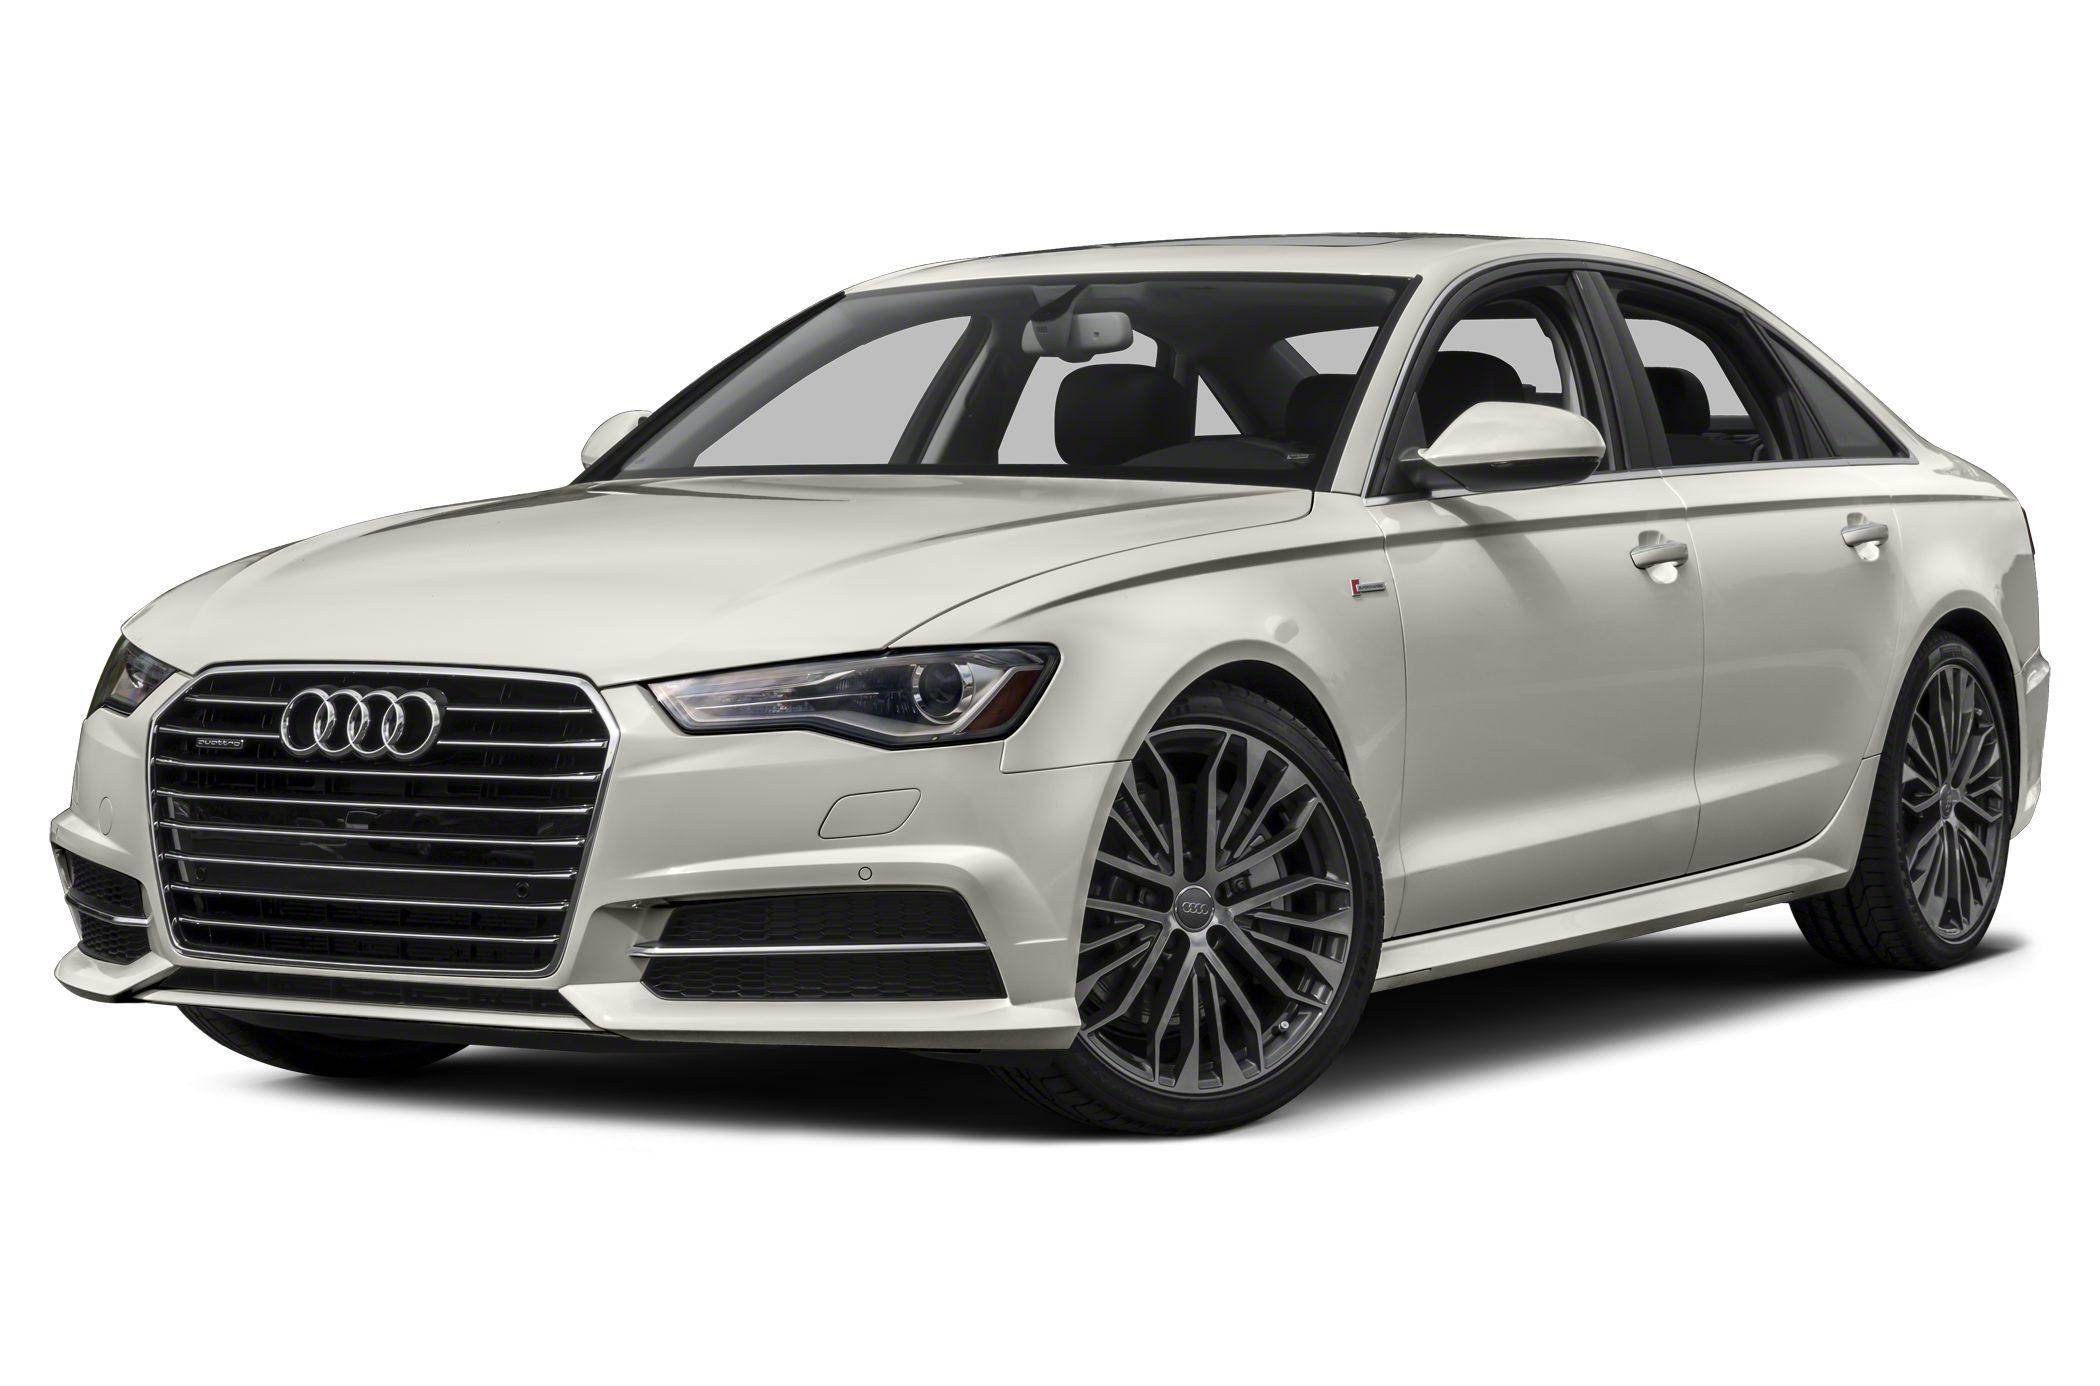 Audi A6 tdi